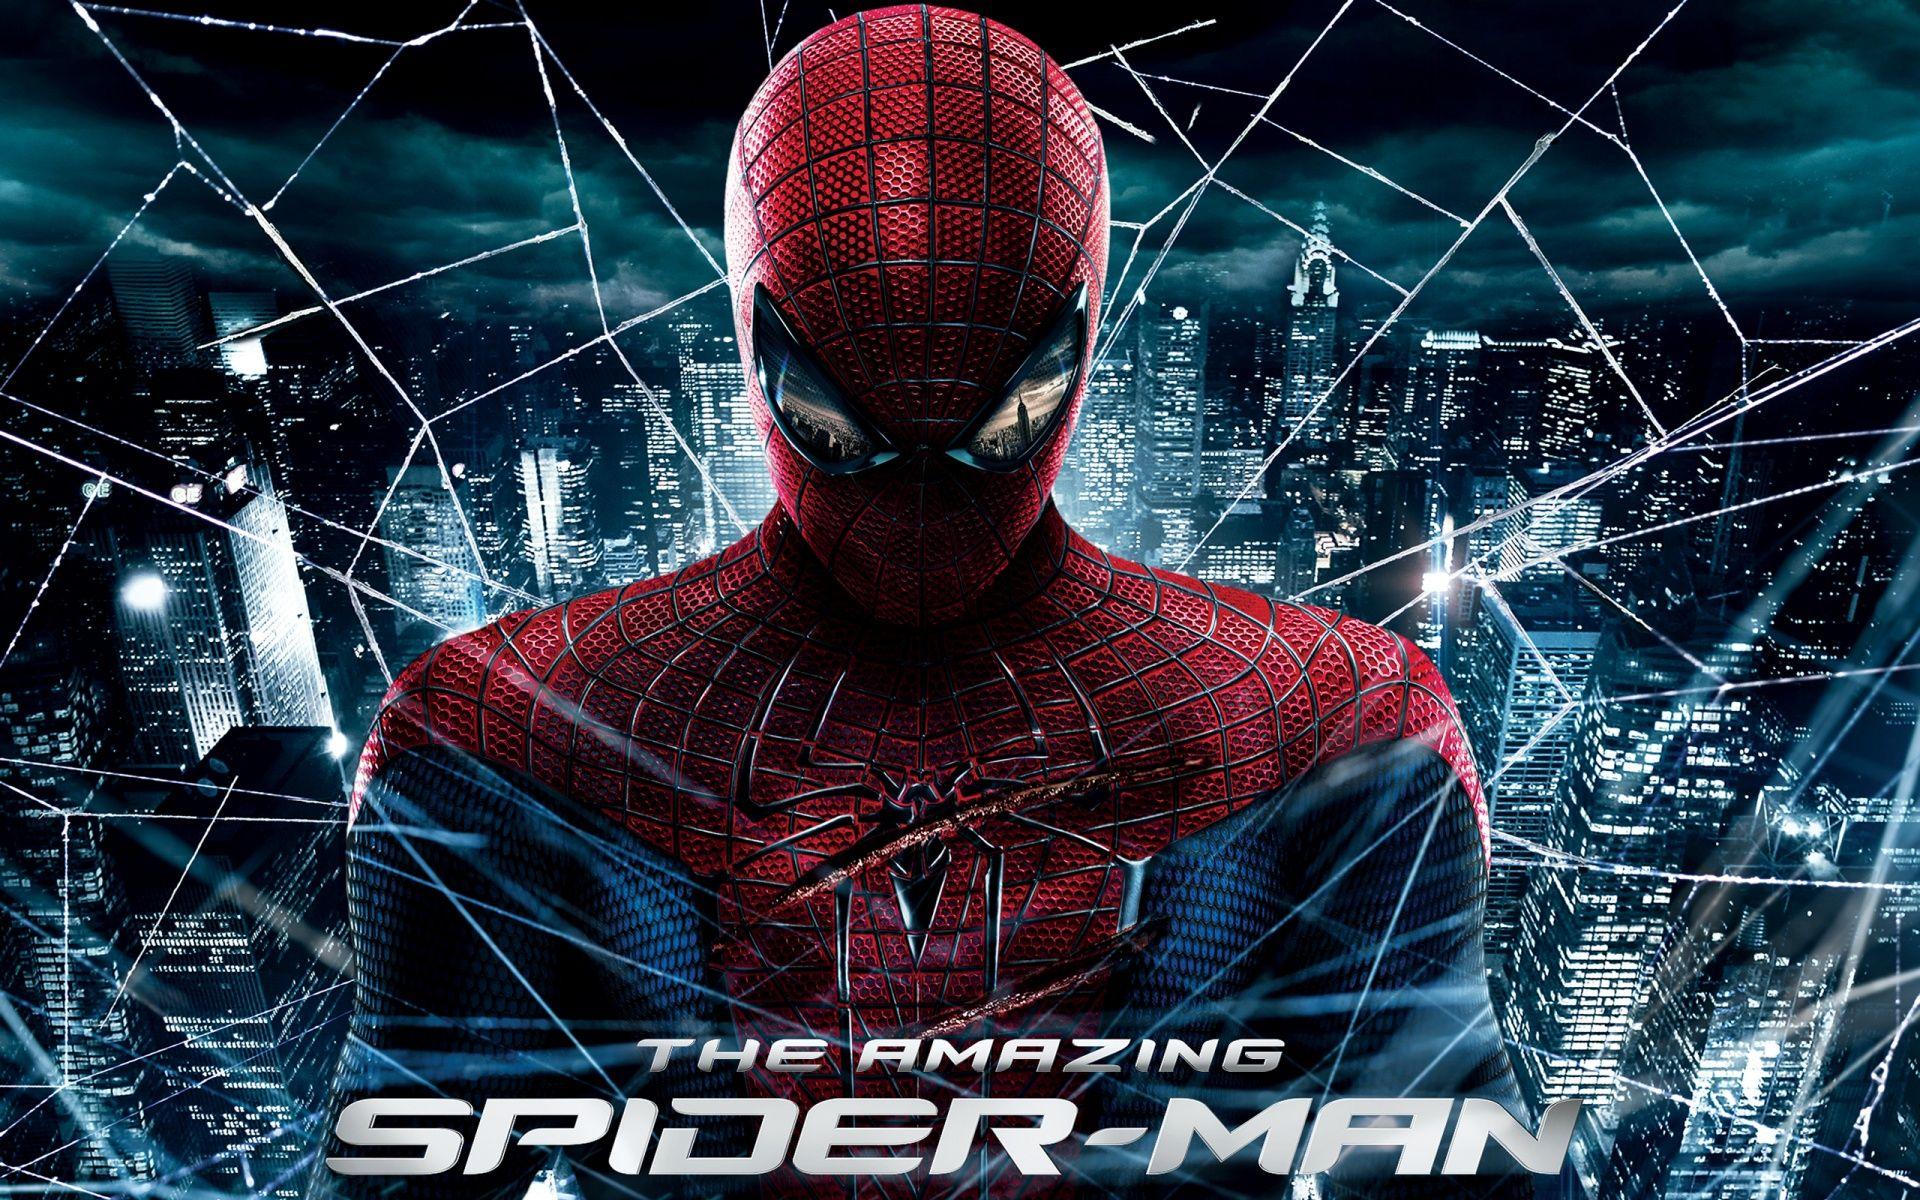 Hd wallpaper hero - Superhero Hd Wallpapers 10 Superhero Desktop Hd Apnatimepass Com